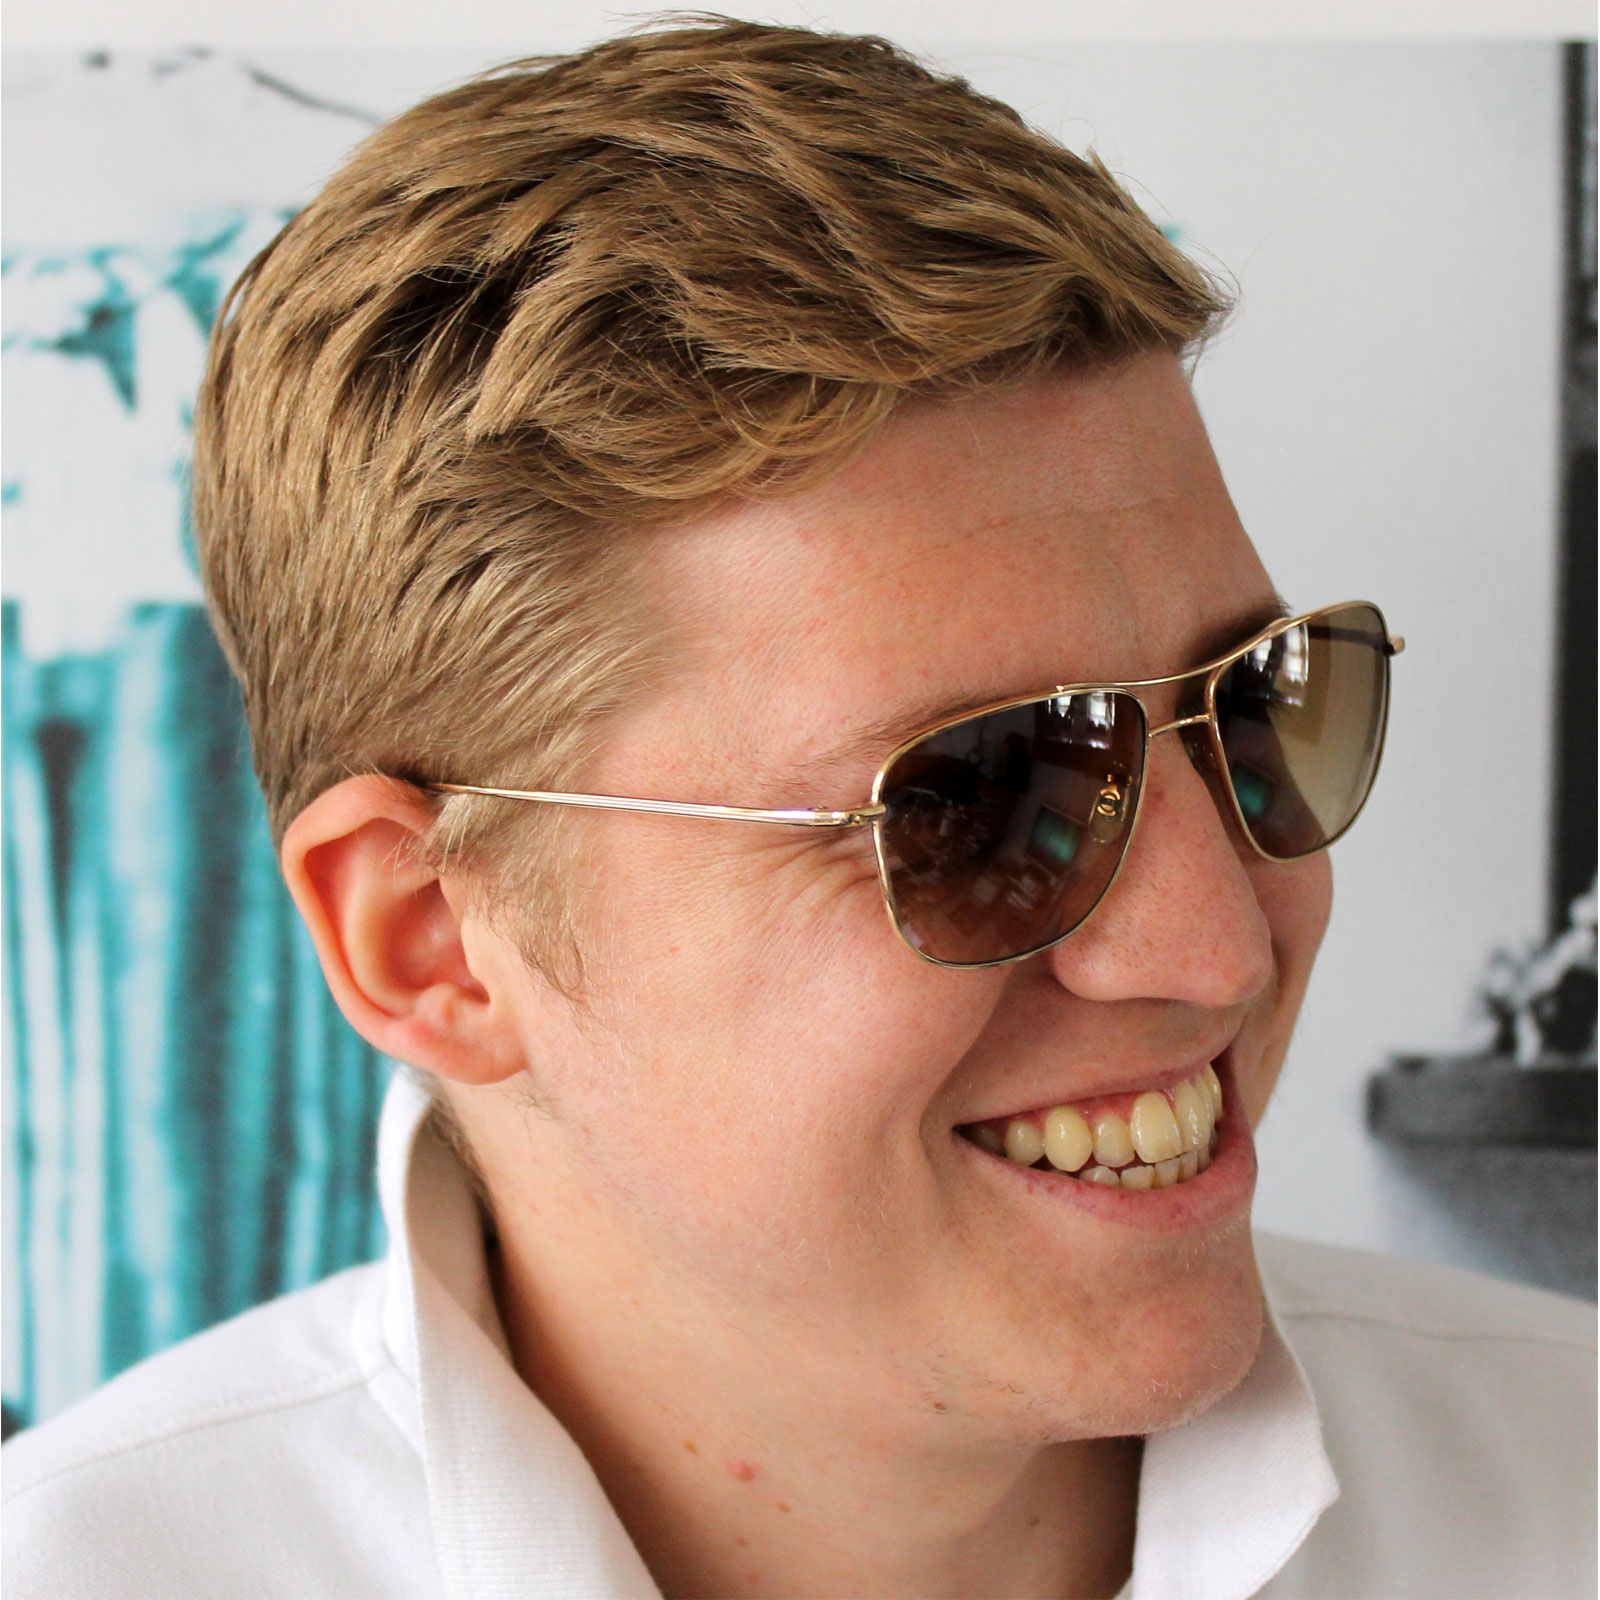 Shaefer Sunglasses Oliver Peoples Sunglasses Shaefer Peoples Oliver 1146 Oliver 1146 E9WDH2IY